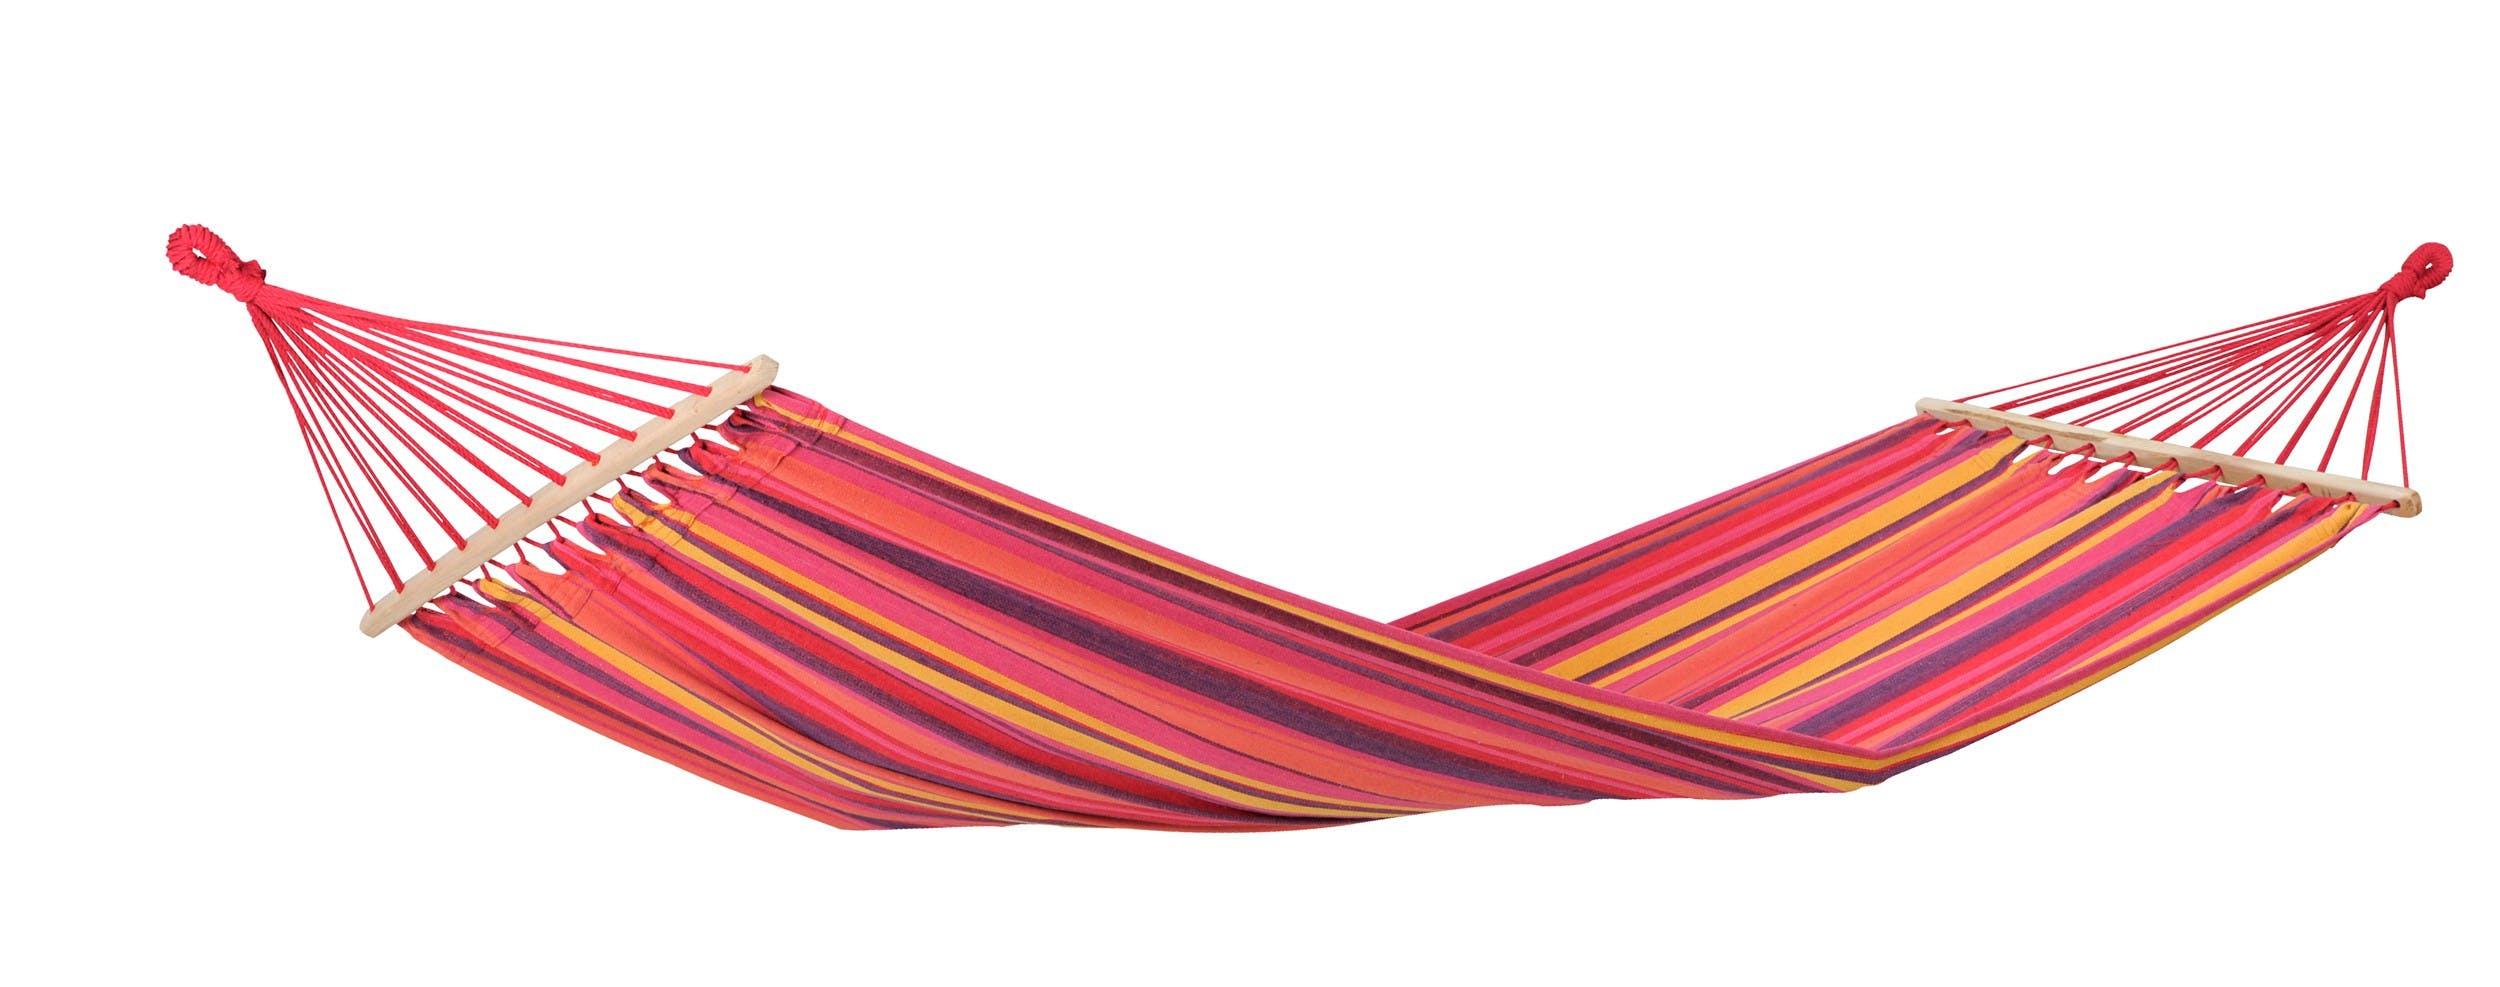 Hamac de jardin XL TONGA Vulcano Rose rouge 200x100cm AMAZONAS